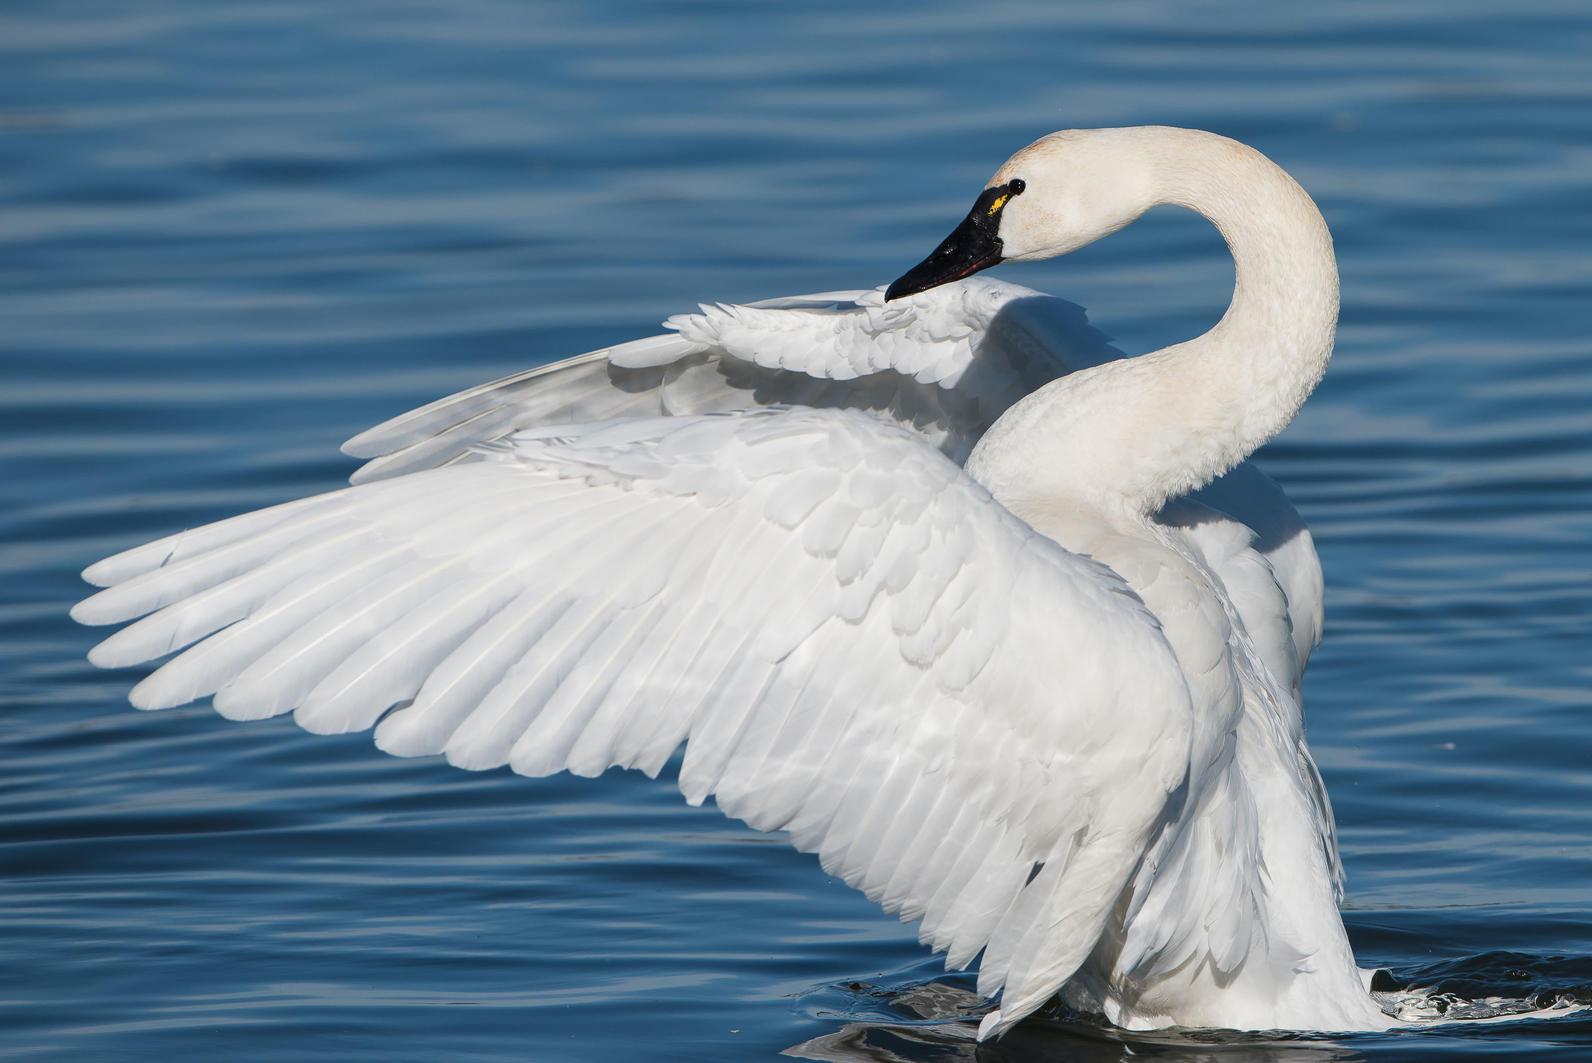 flight of the swan audubon south carolina